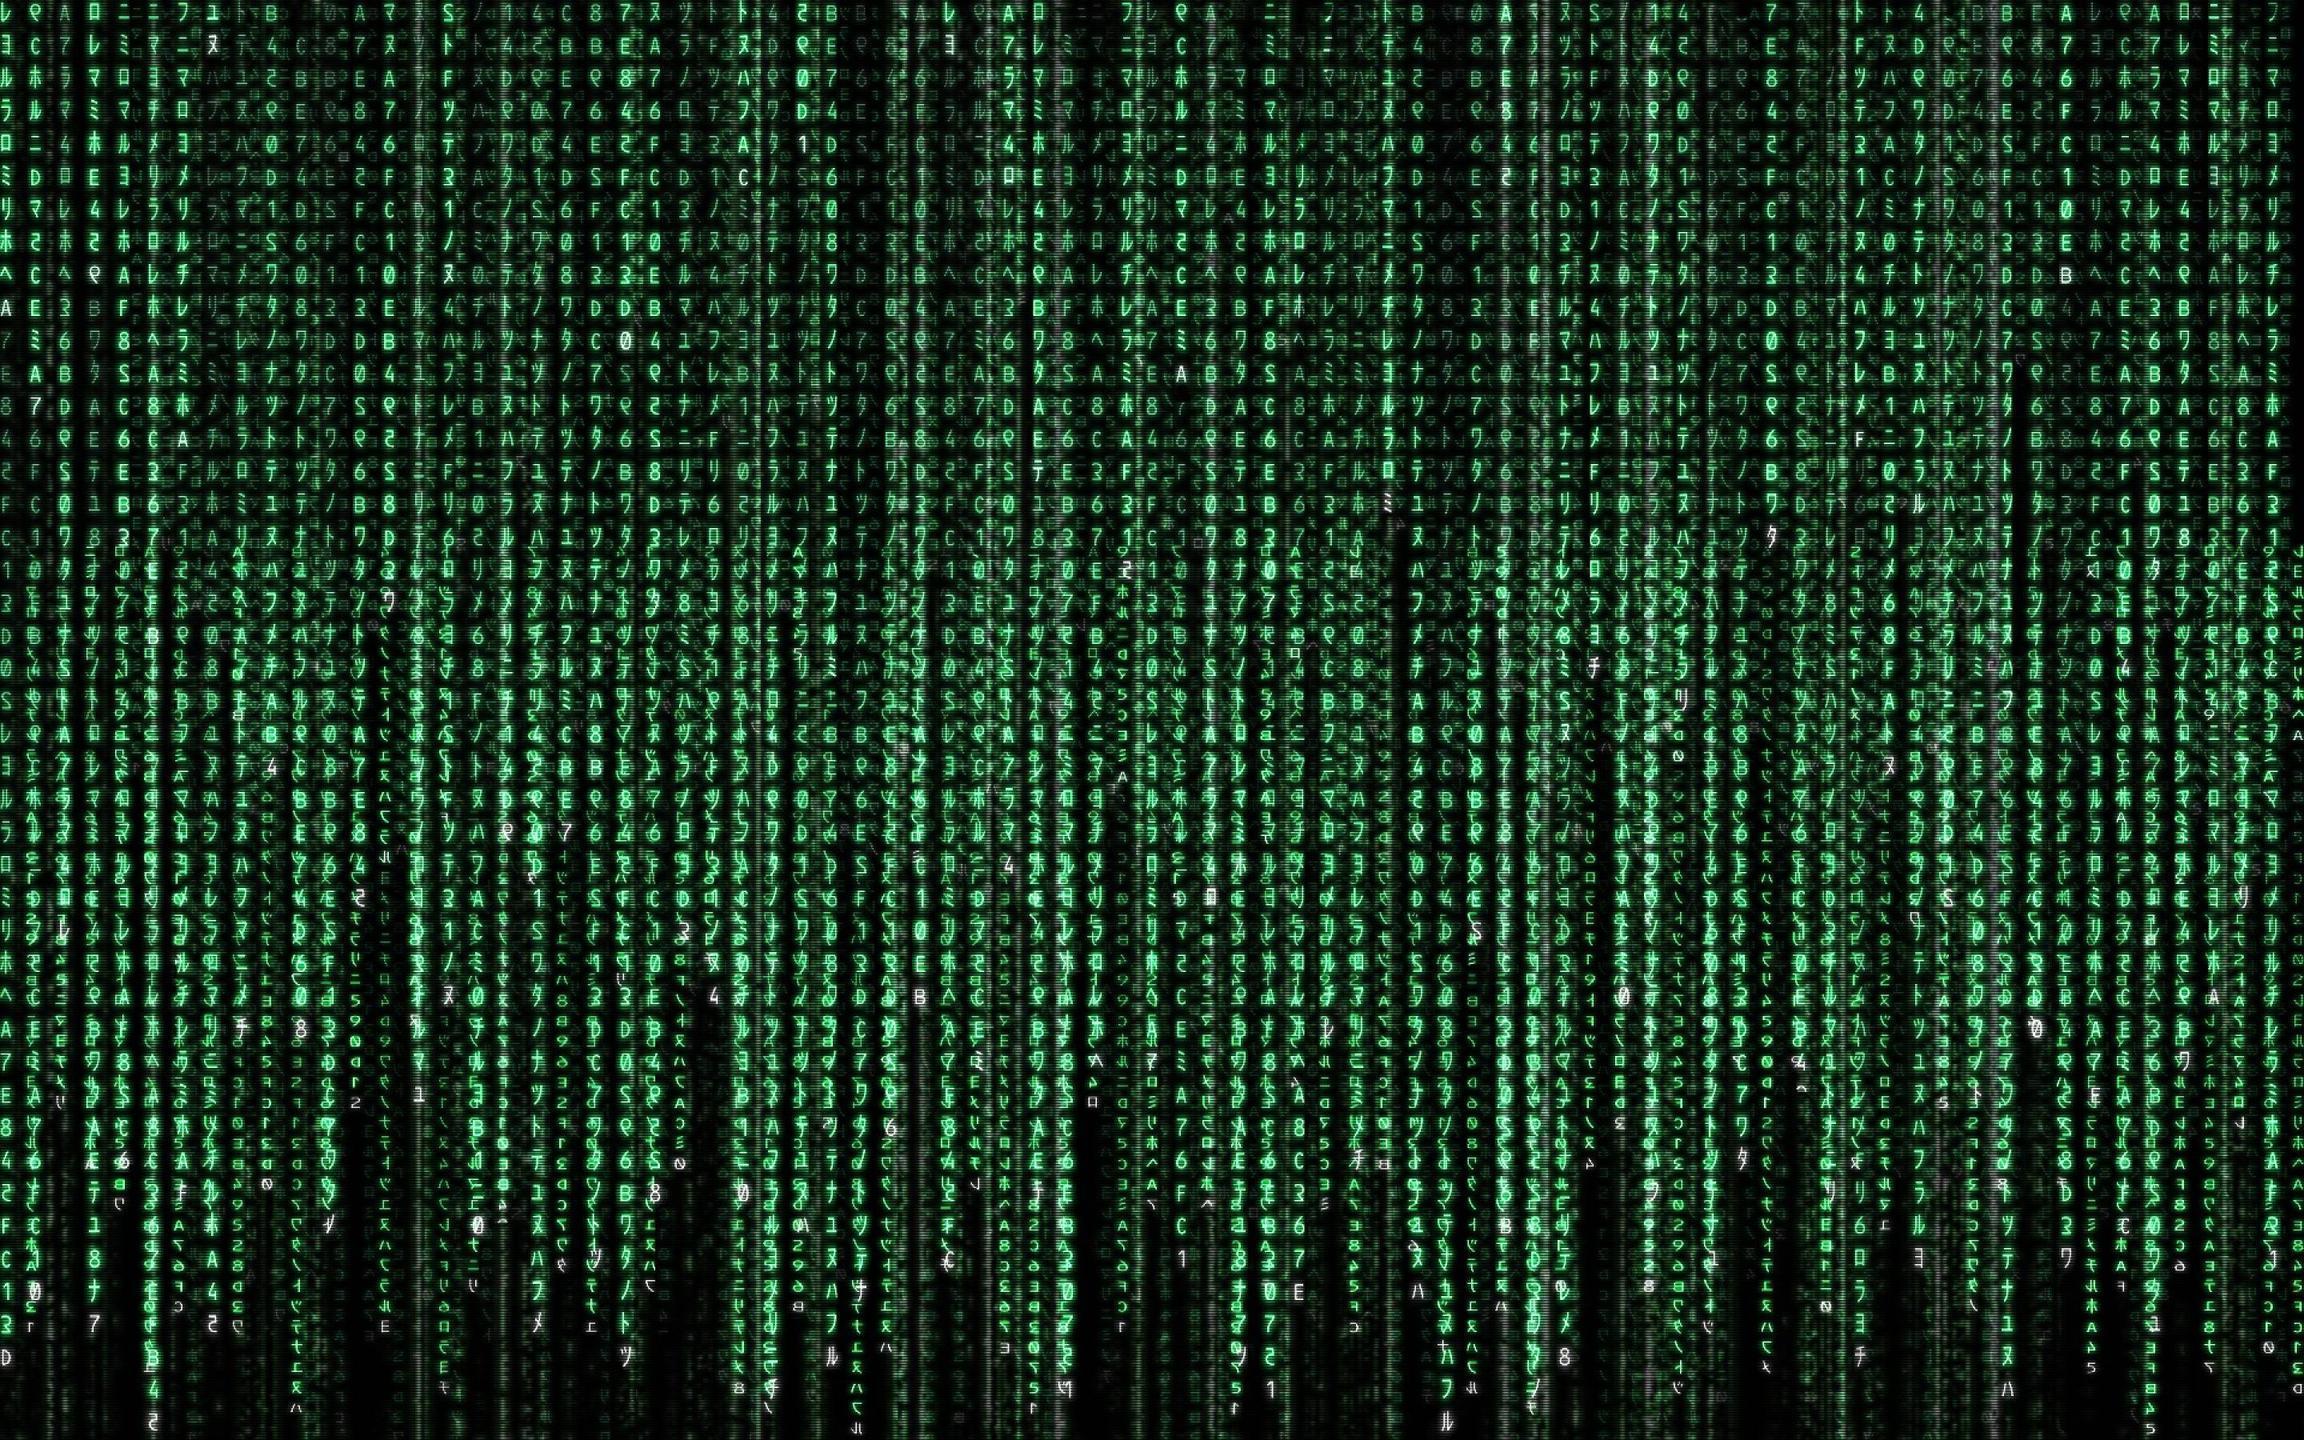 Hacker Backgrounds 2304x1440